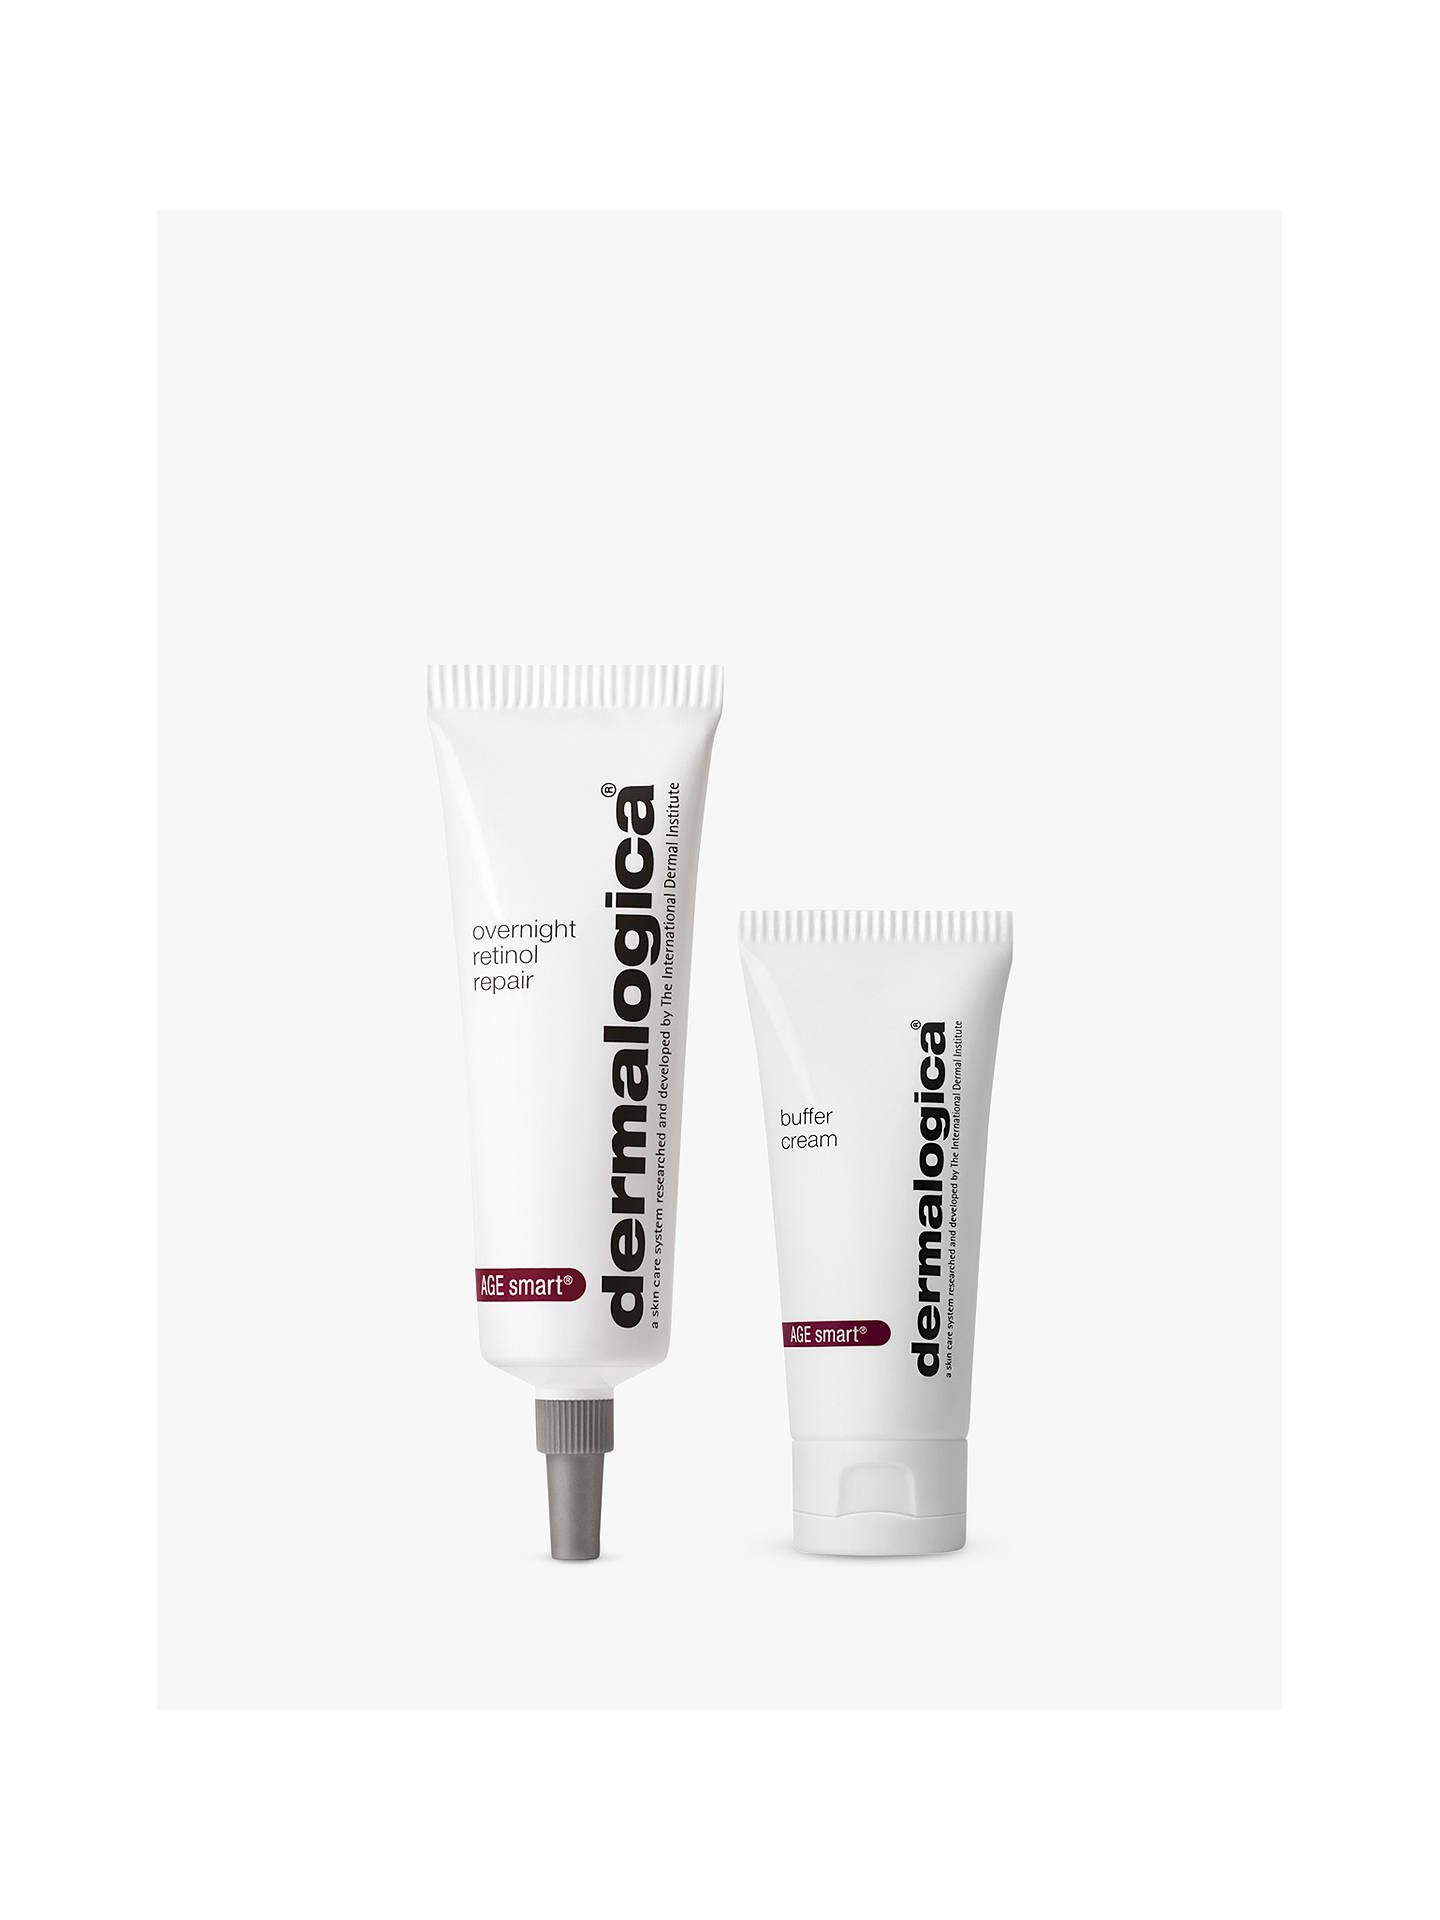 BuyDermalogica AGE Smart™ Treatment Overnight Retinol Repair Skincare Gift Set Online at johnlewis.com